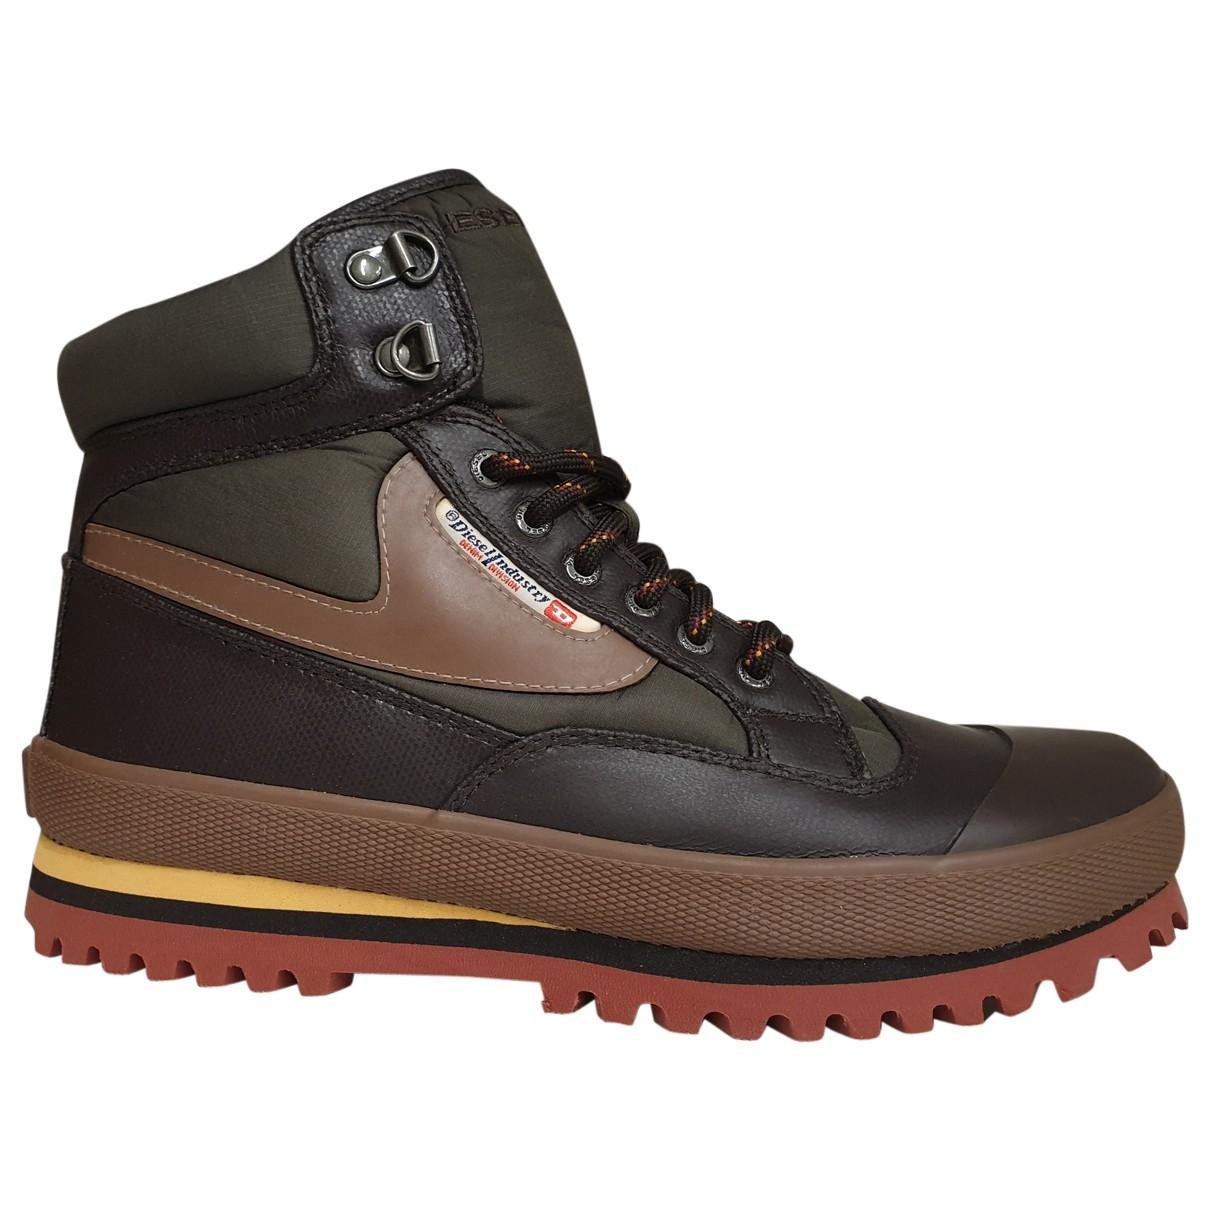 Diesel \N Brown Leather Boots for Men 41 EU